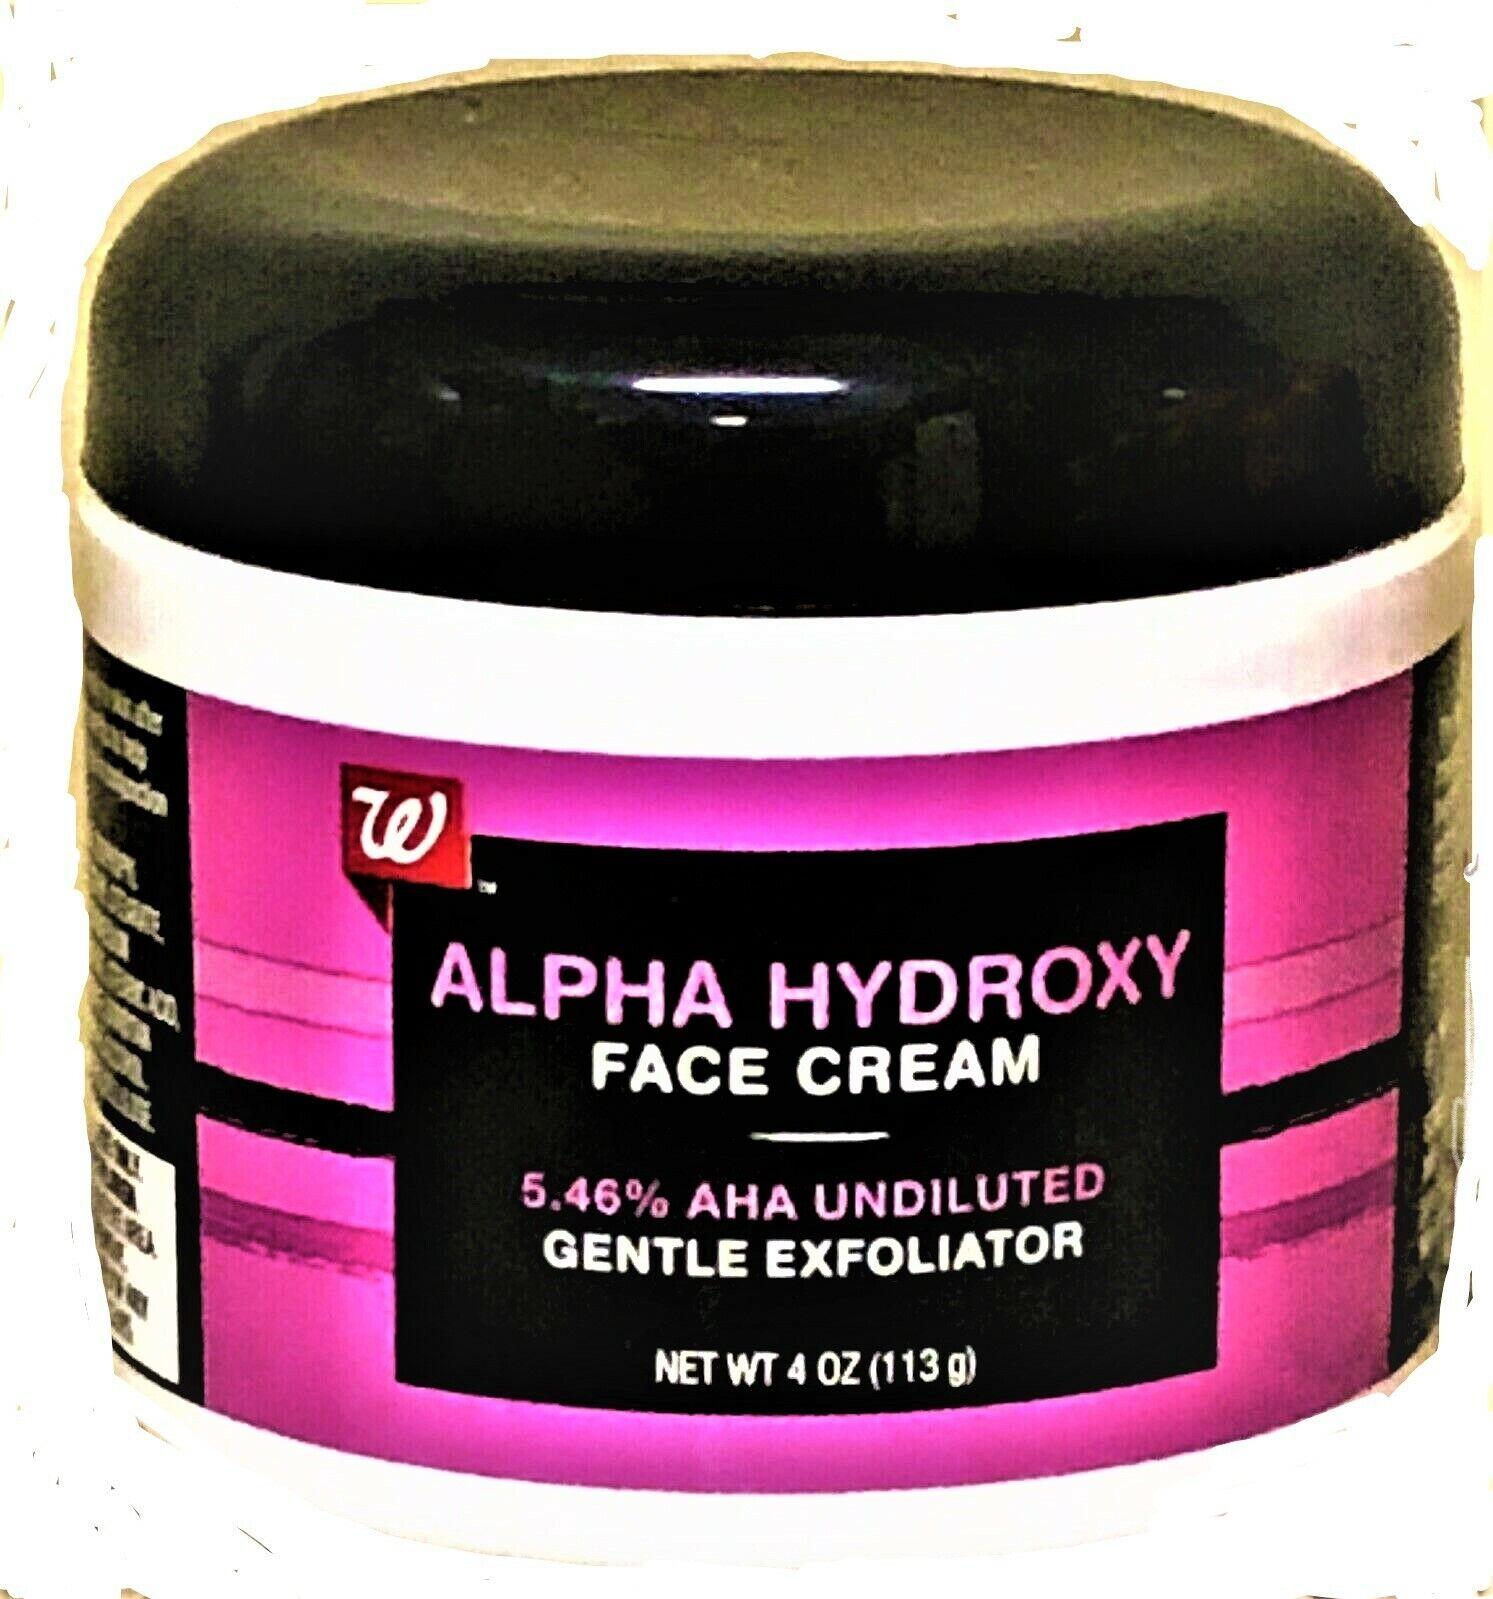 alpha hydroxy face cream